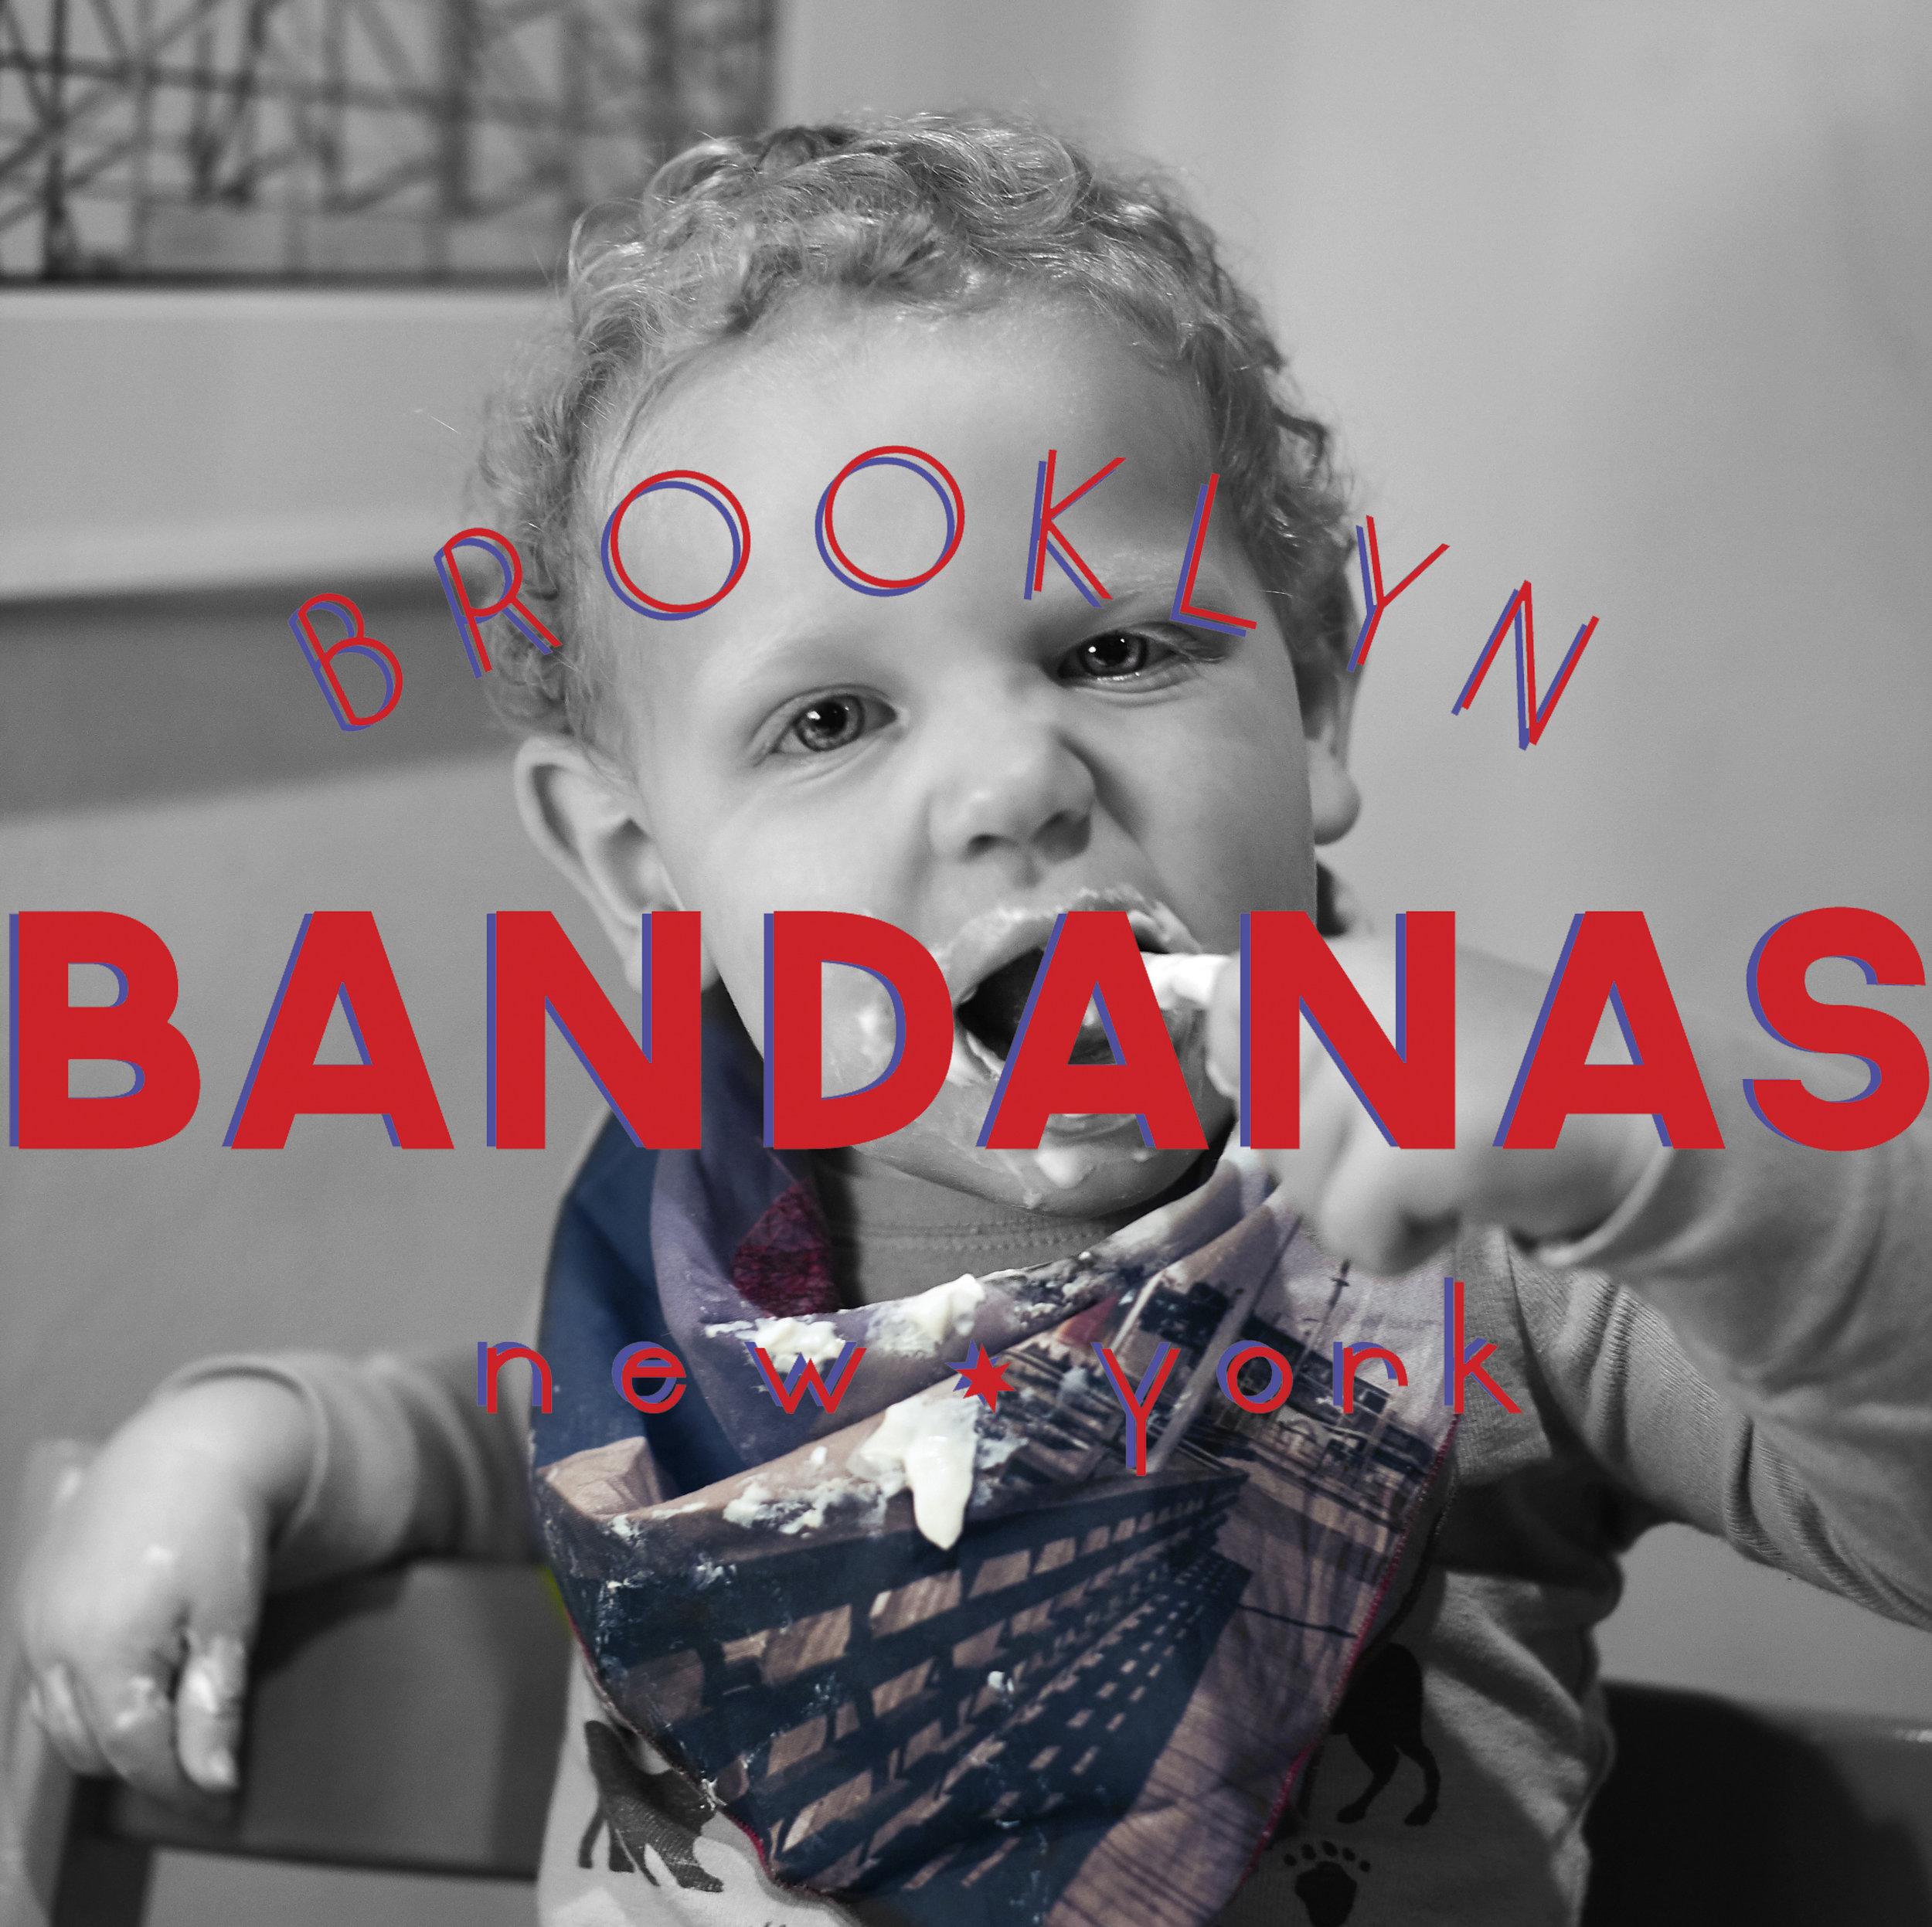 If (Brooklyn Bandanas = Cute) & (Cute = Babies) Then (Brooklyn Bandanas = Babies)  Do the Math, Get a cute Brooklyn Bandana on that Cute Baby ASAP!